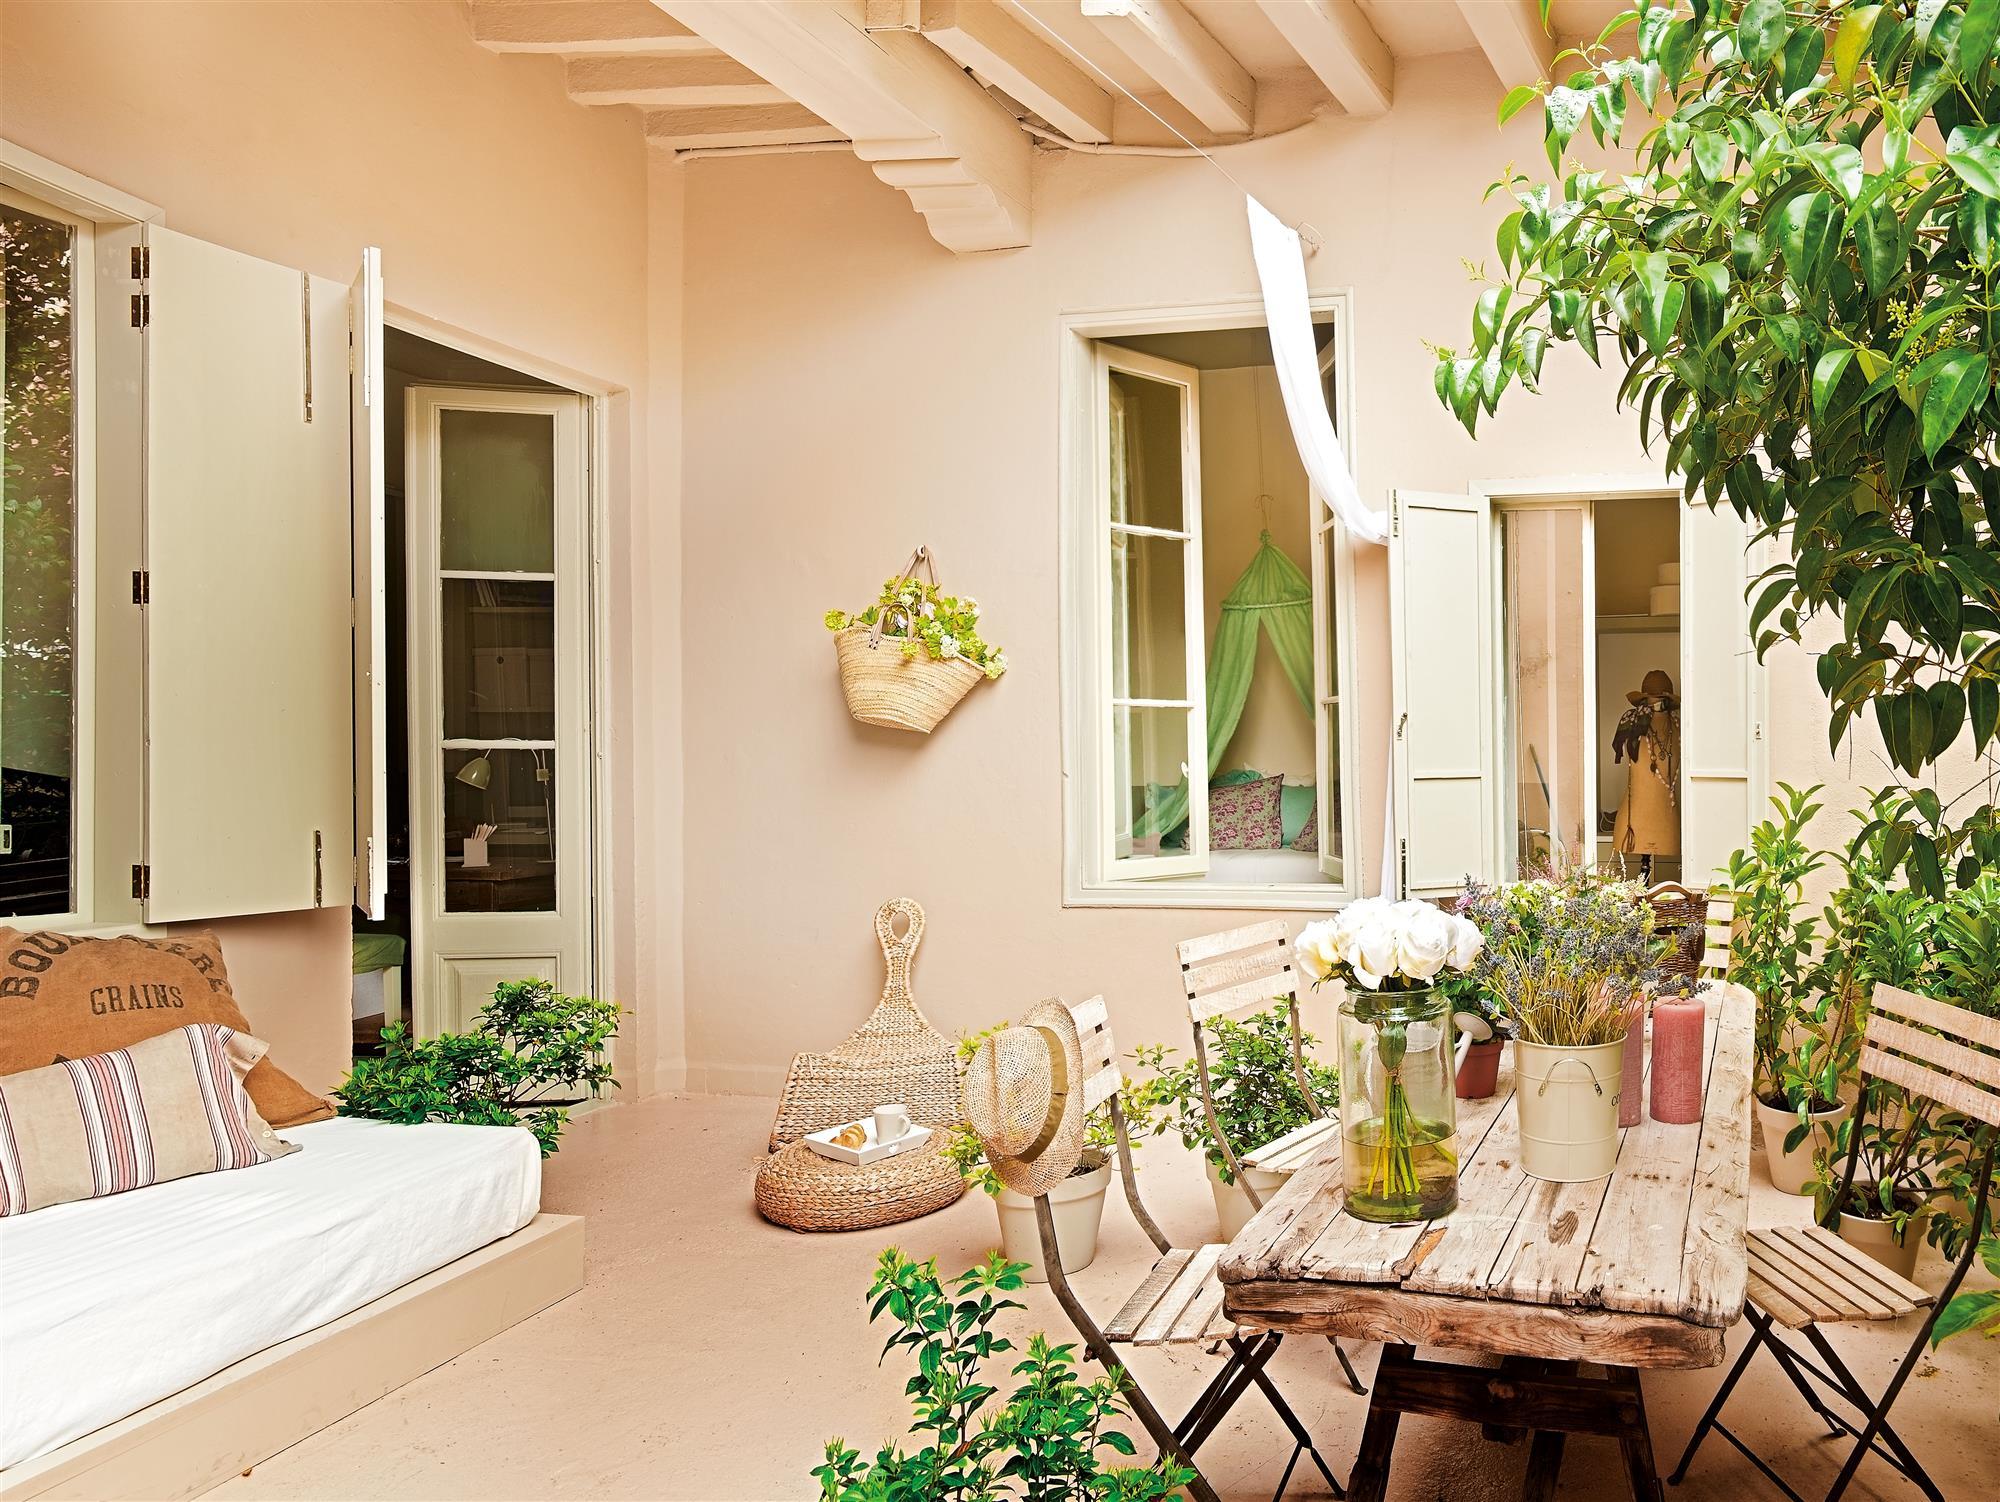 5 Casas Con Patio